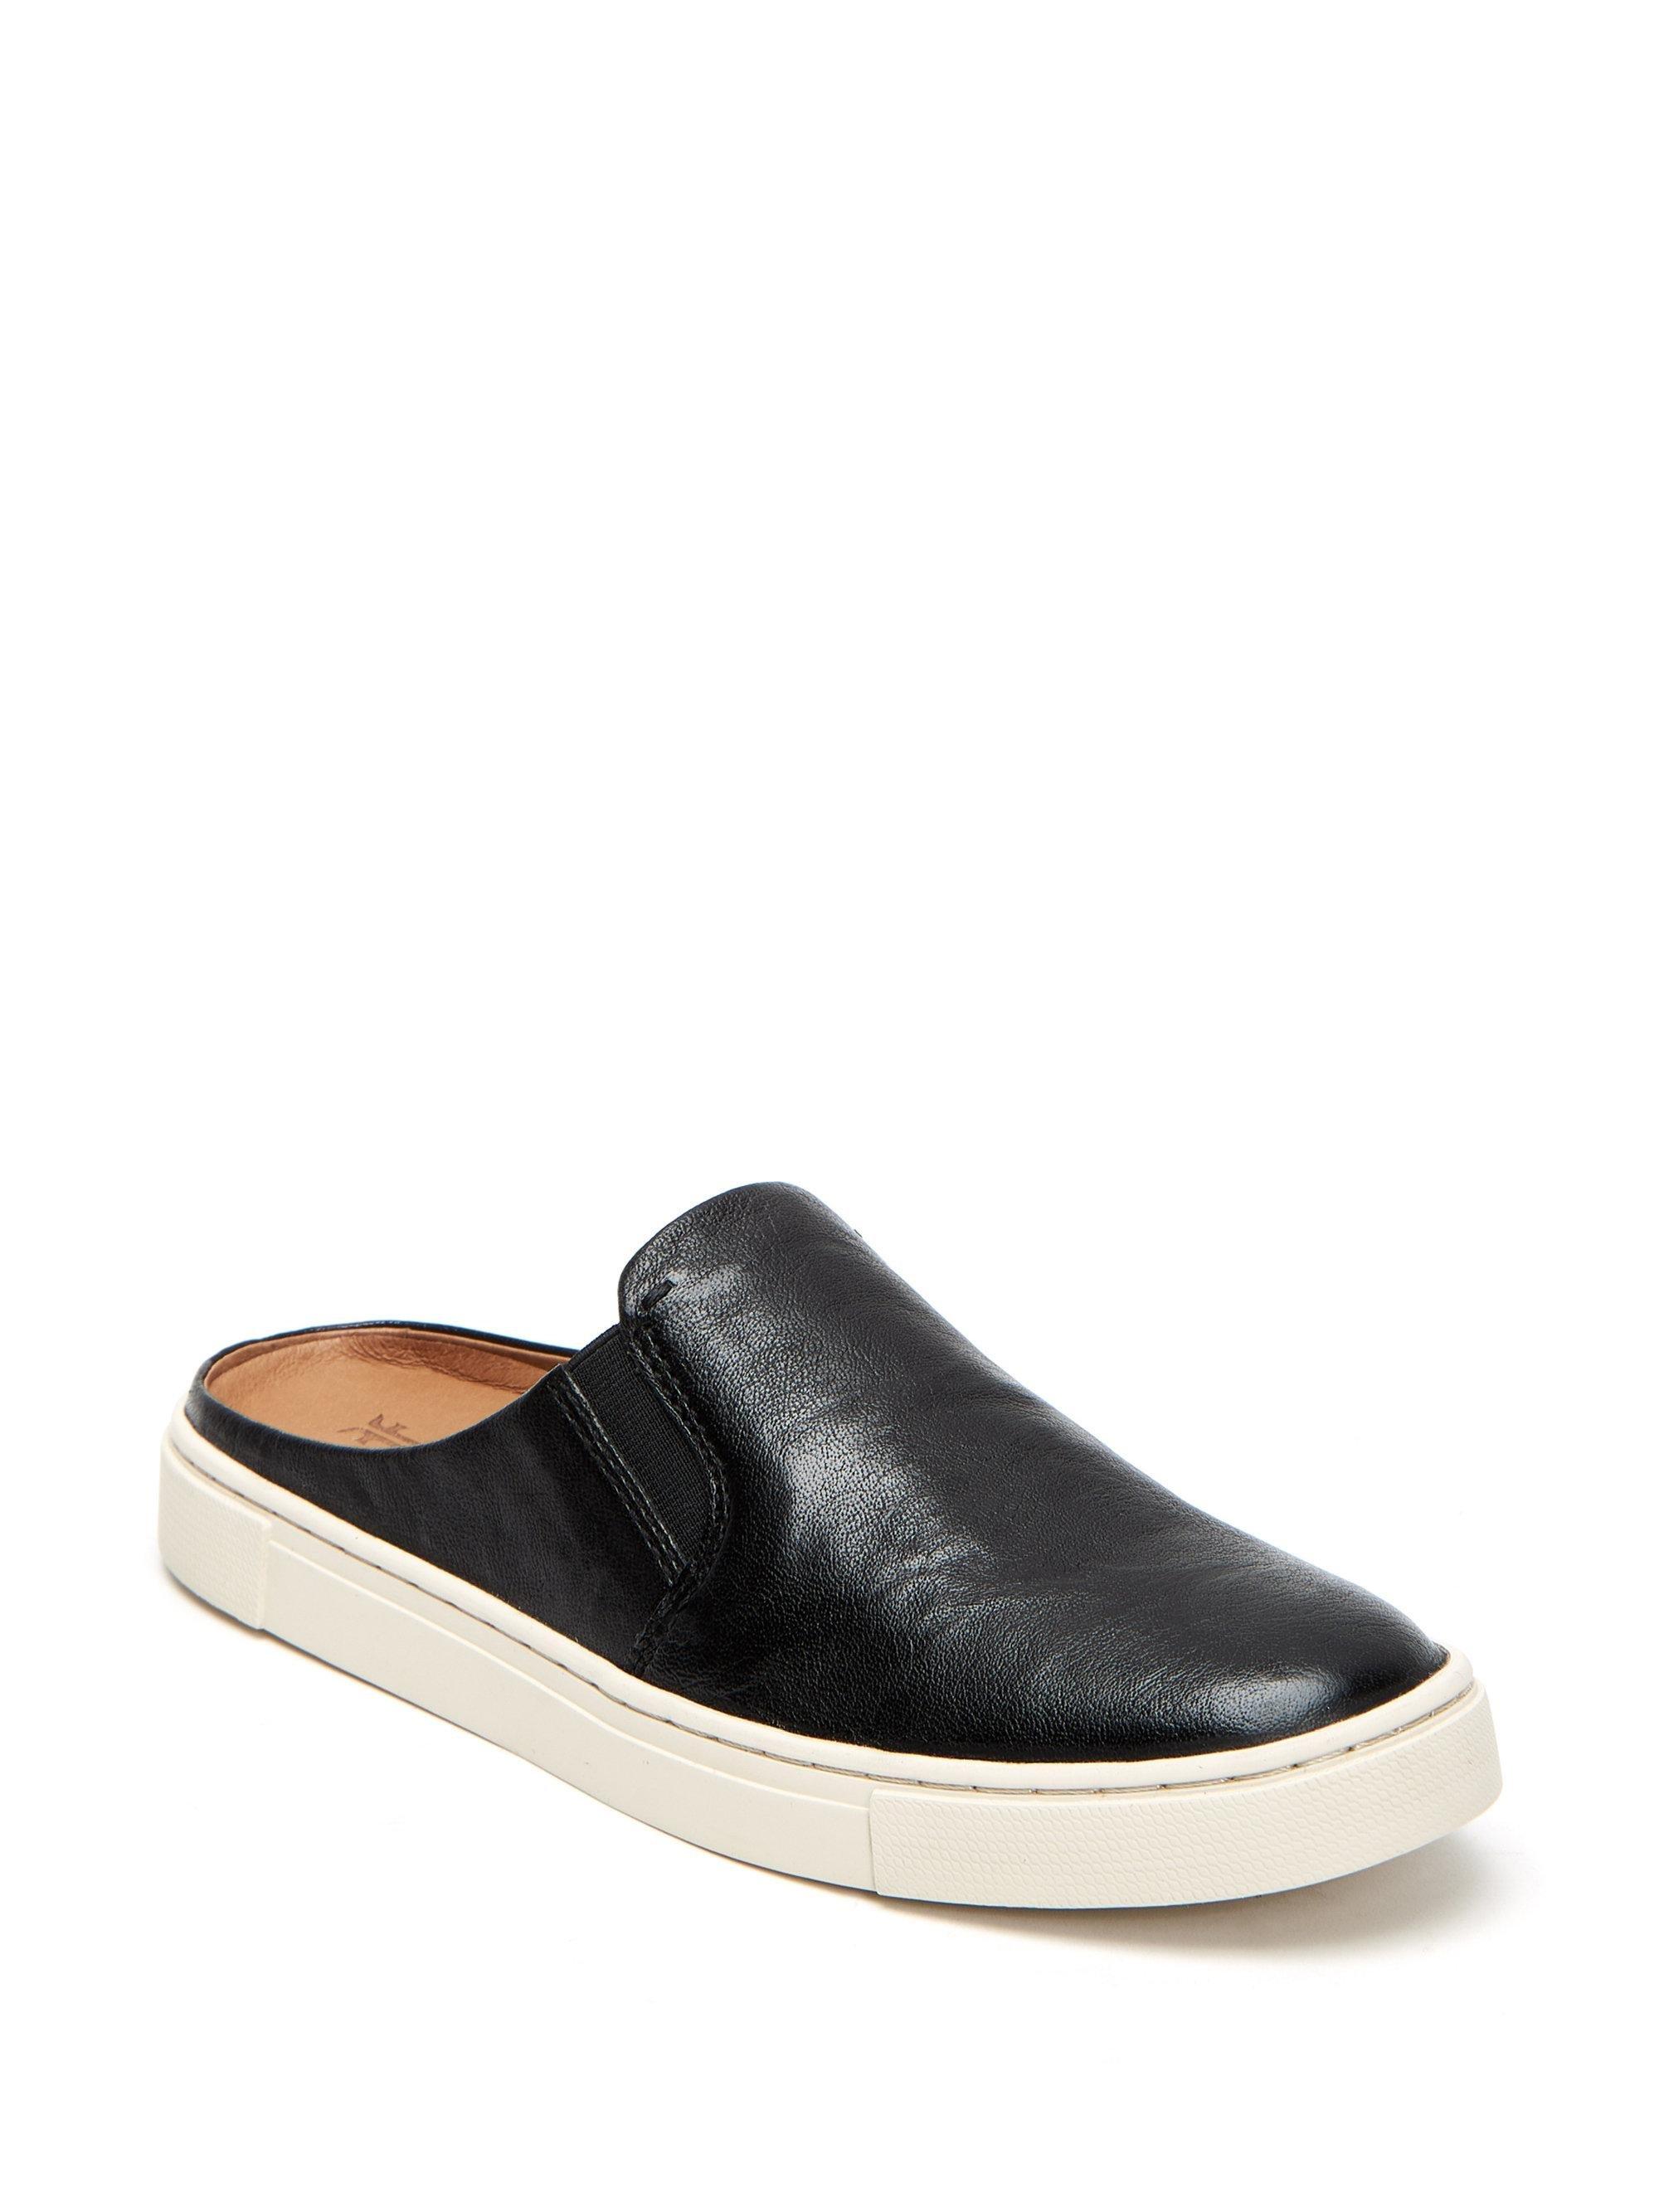 Frye Ivy Sneaker Mules mmXV3Cx